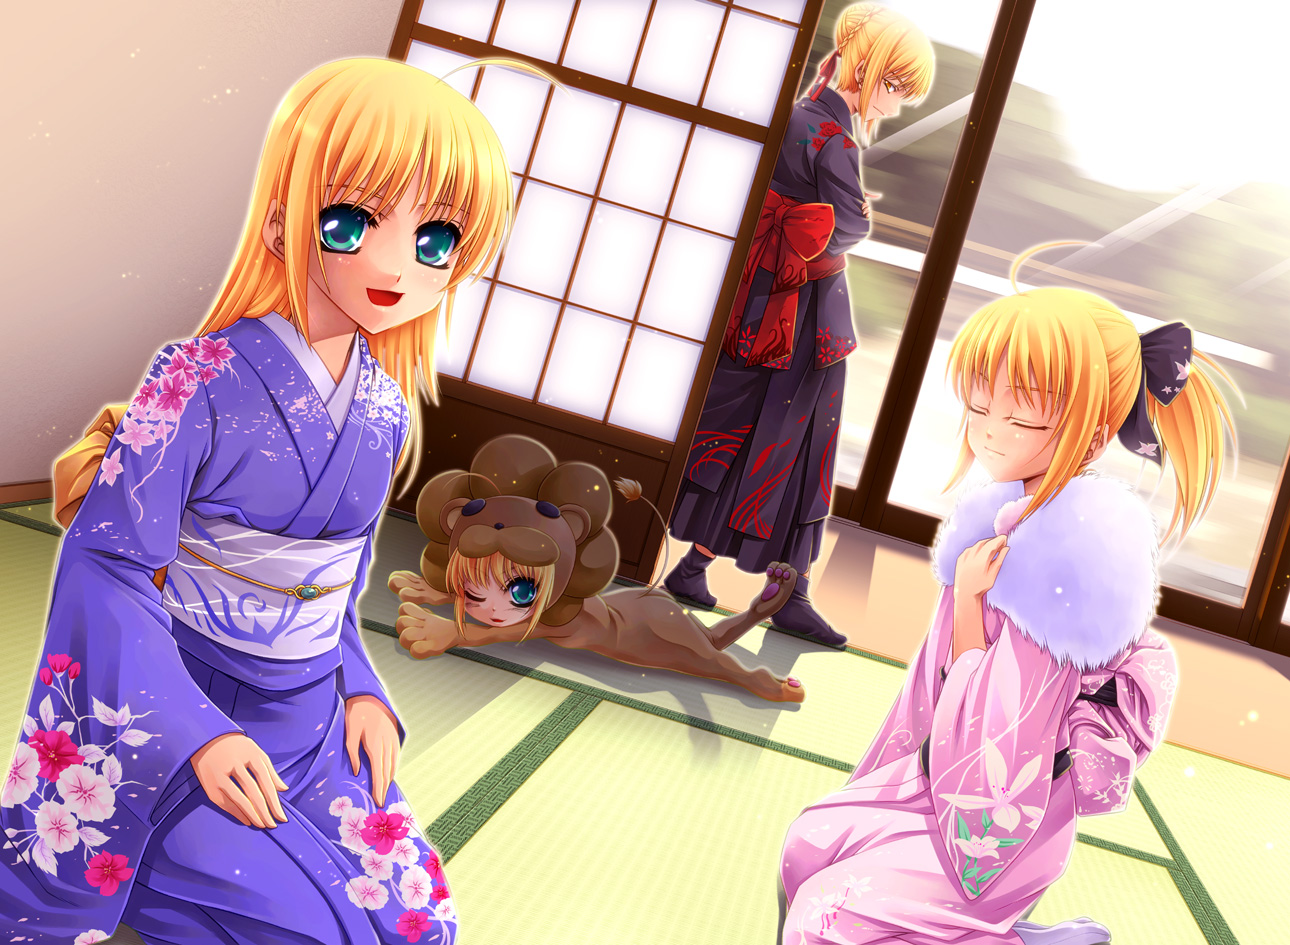 Minitokyo_Fate-Stay_Night_Scans_368902.jpg